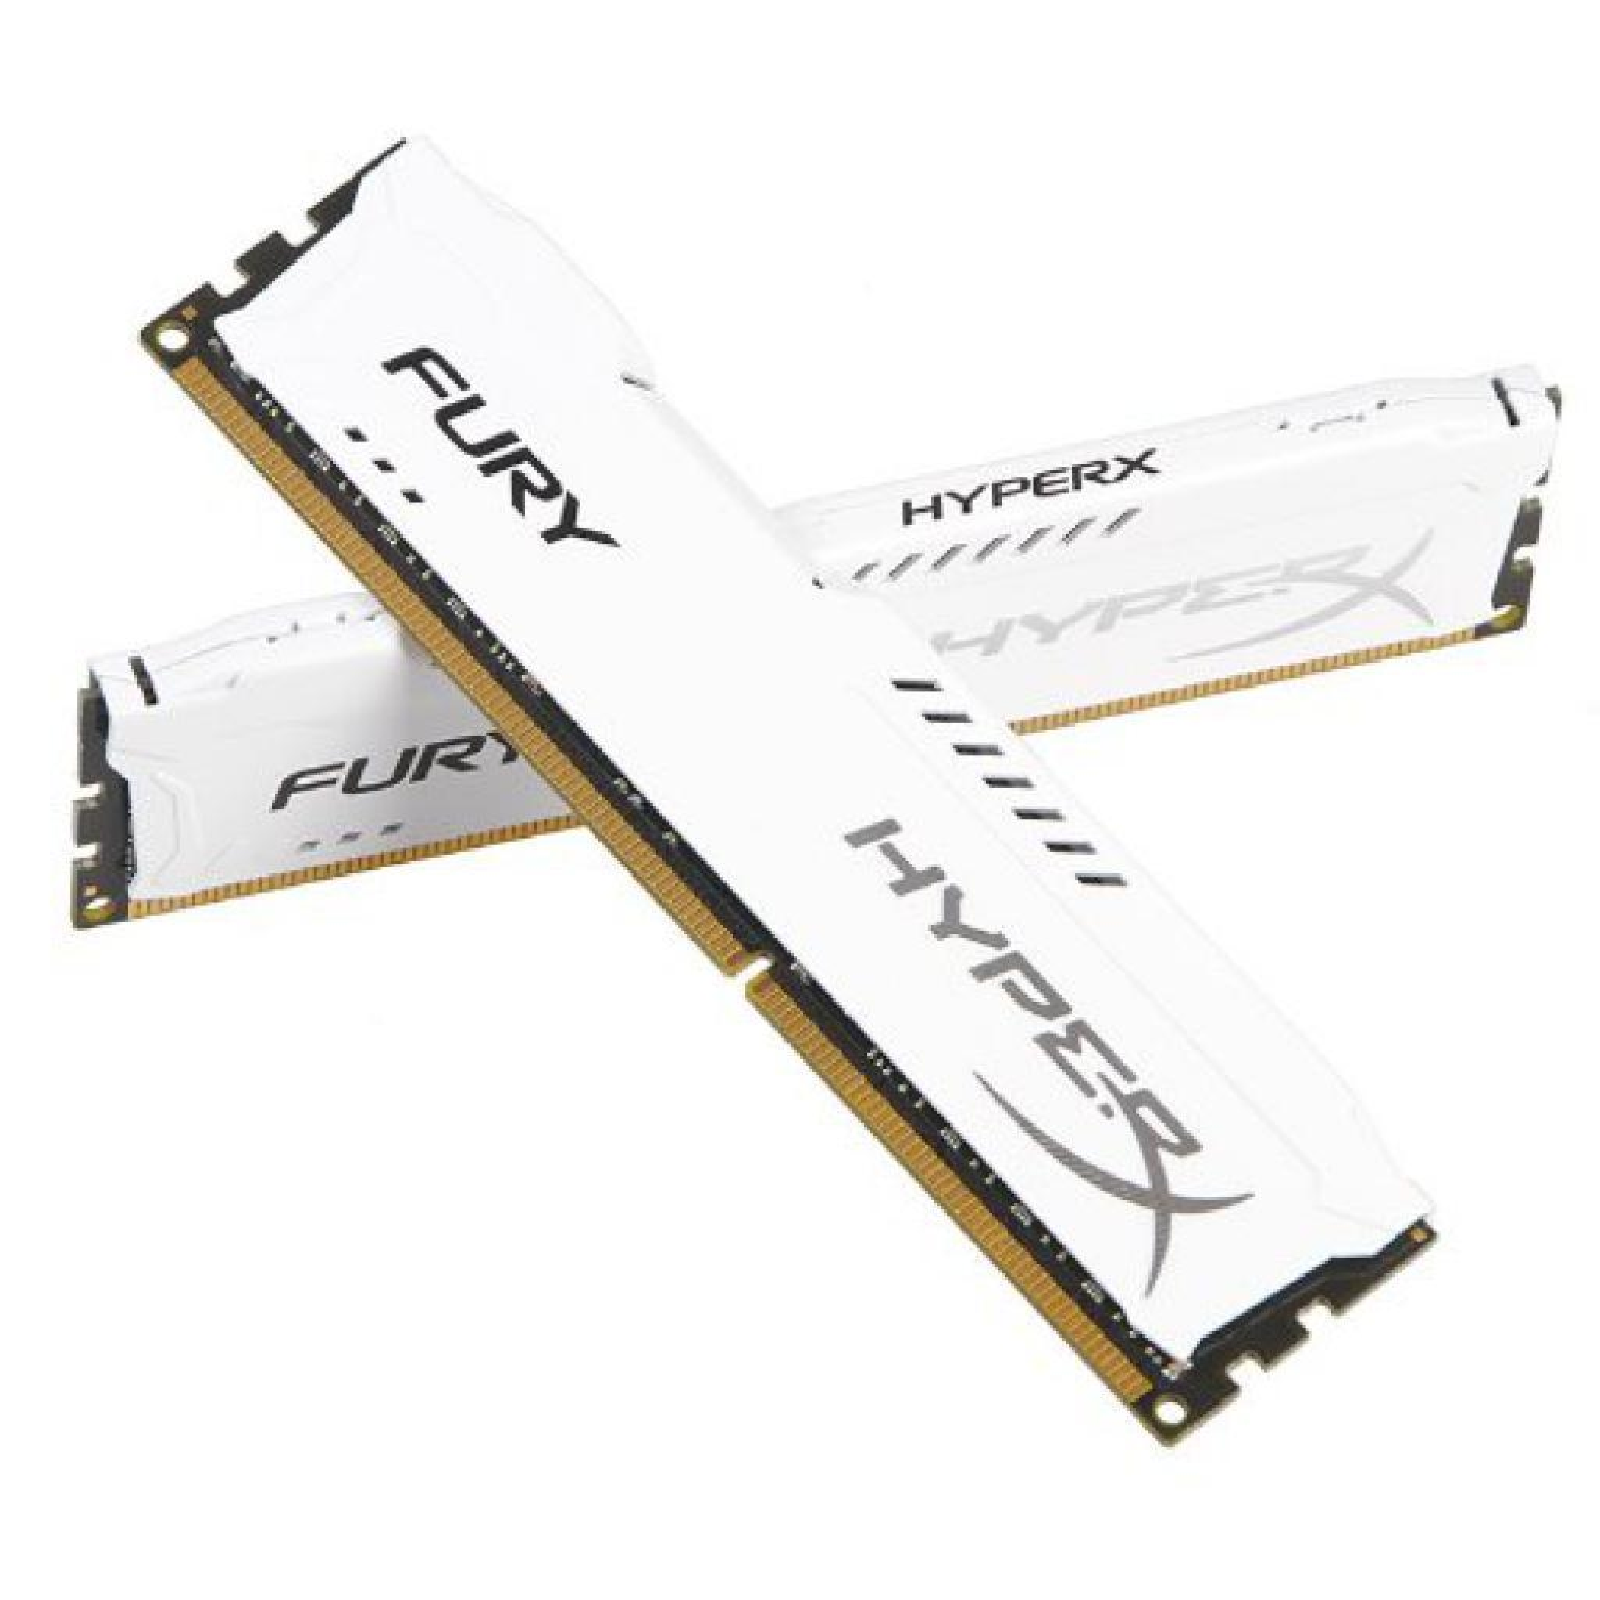 Модуль памяти для компьютера DDR4 16GB (2x8GB) 2933 MHz HyperX FURY White HyperX (Kingston Fury) (HX429C17FW2K2/16) изображение 3